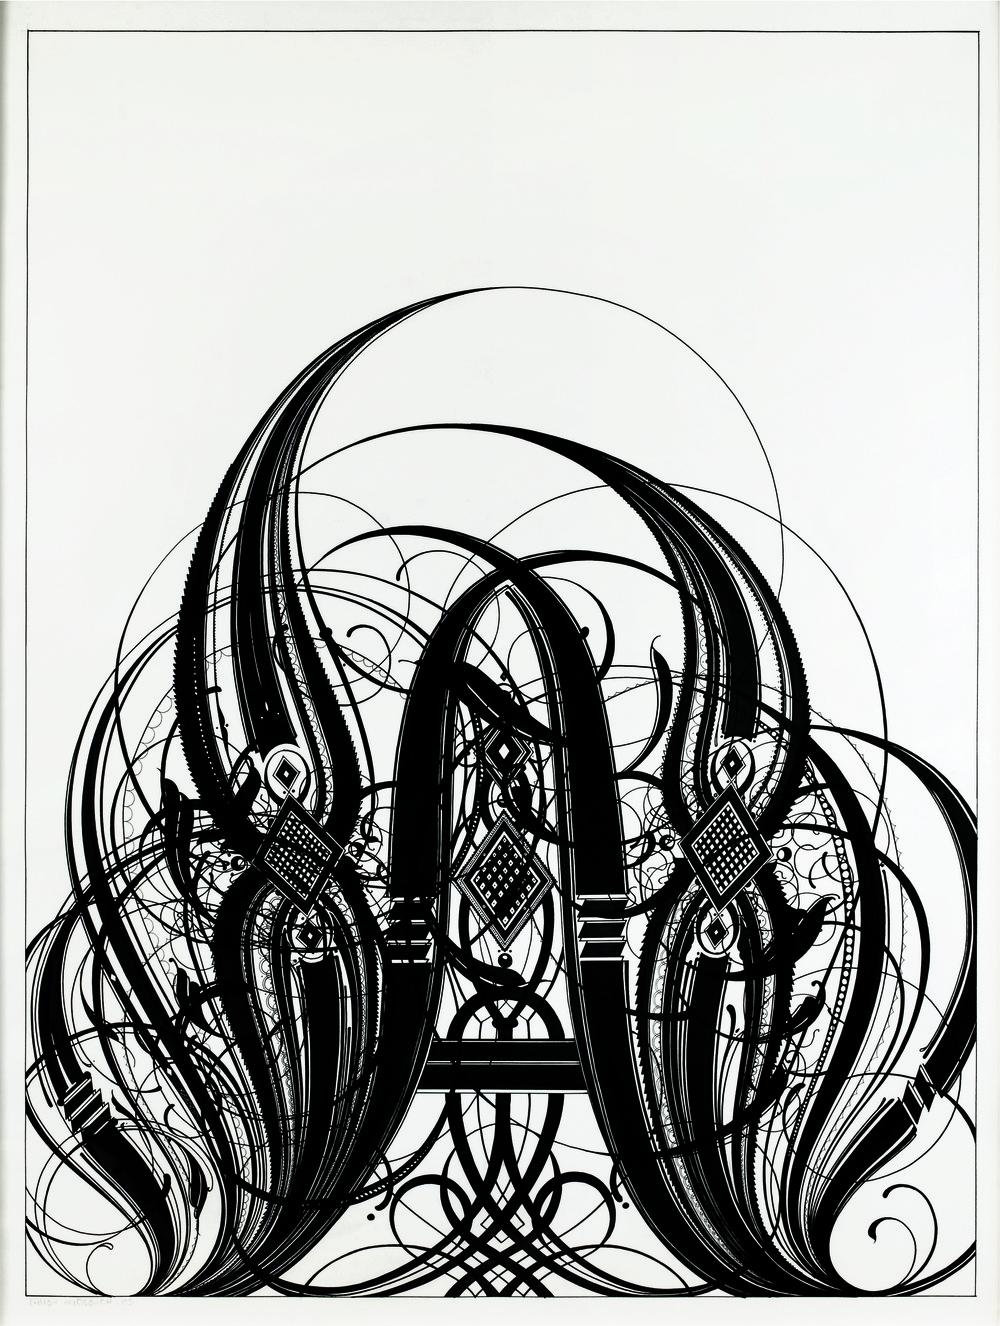 Tauba Auerbach - Illustrations